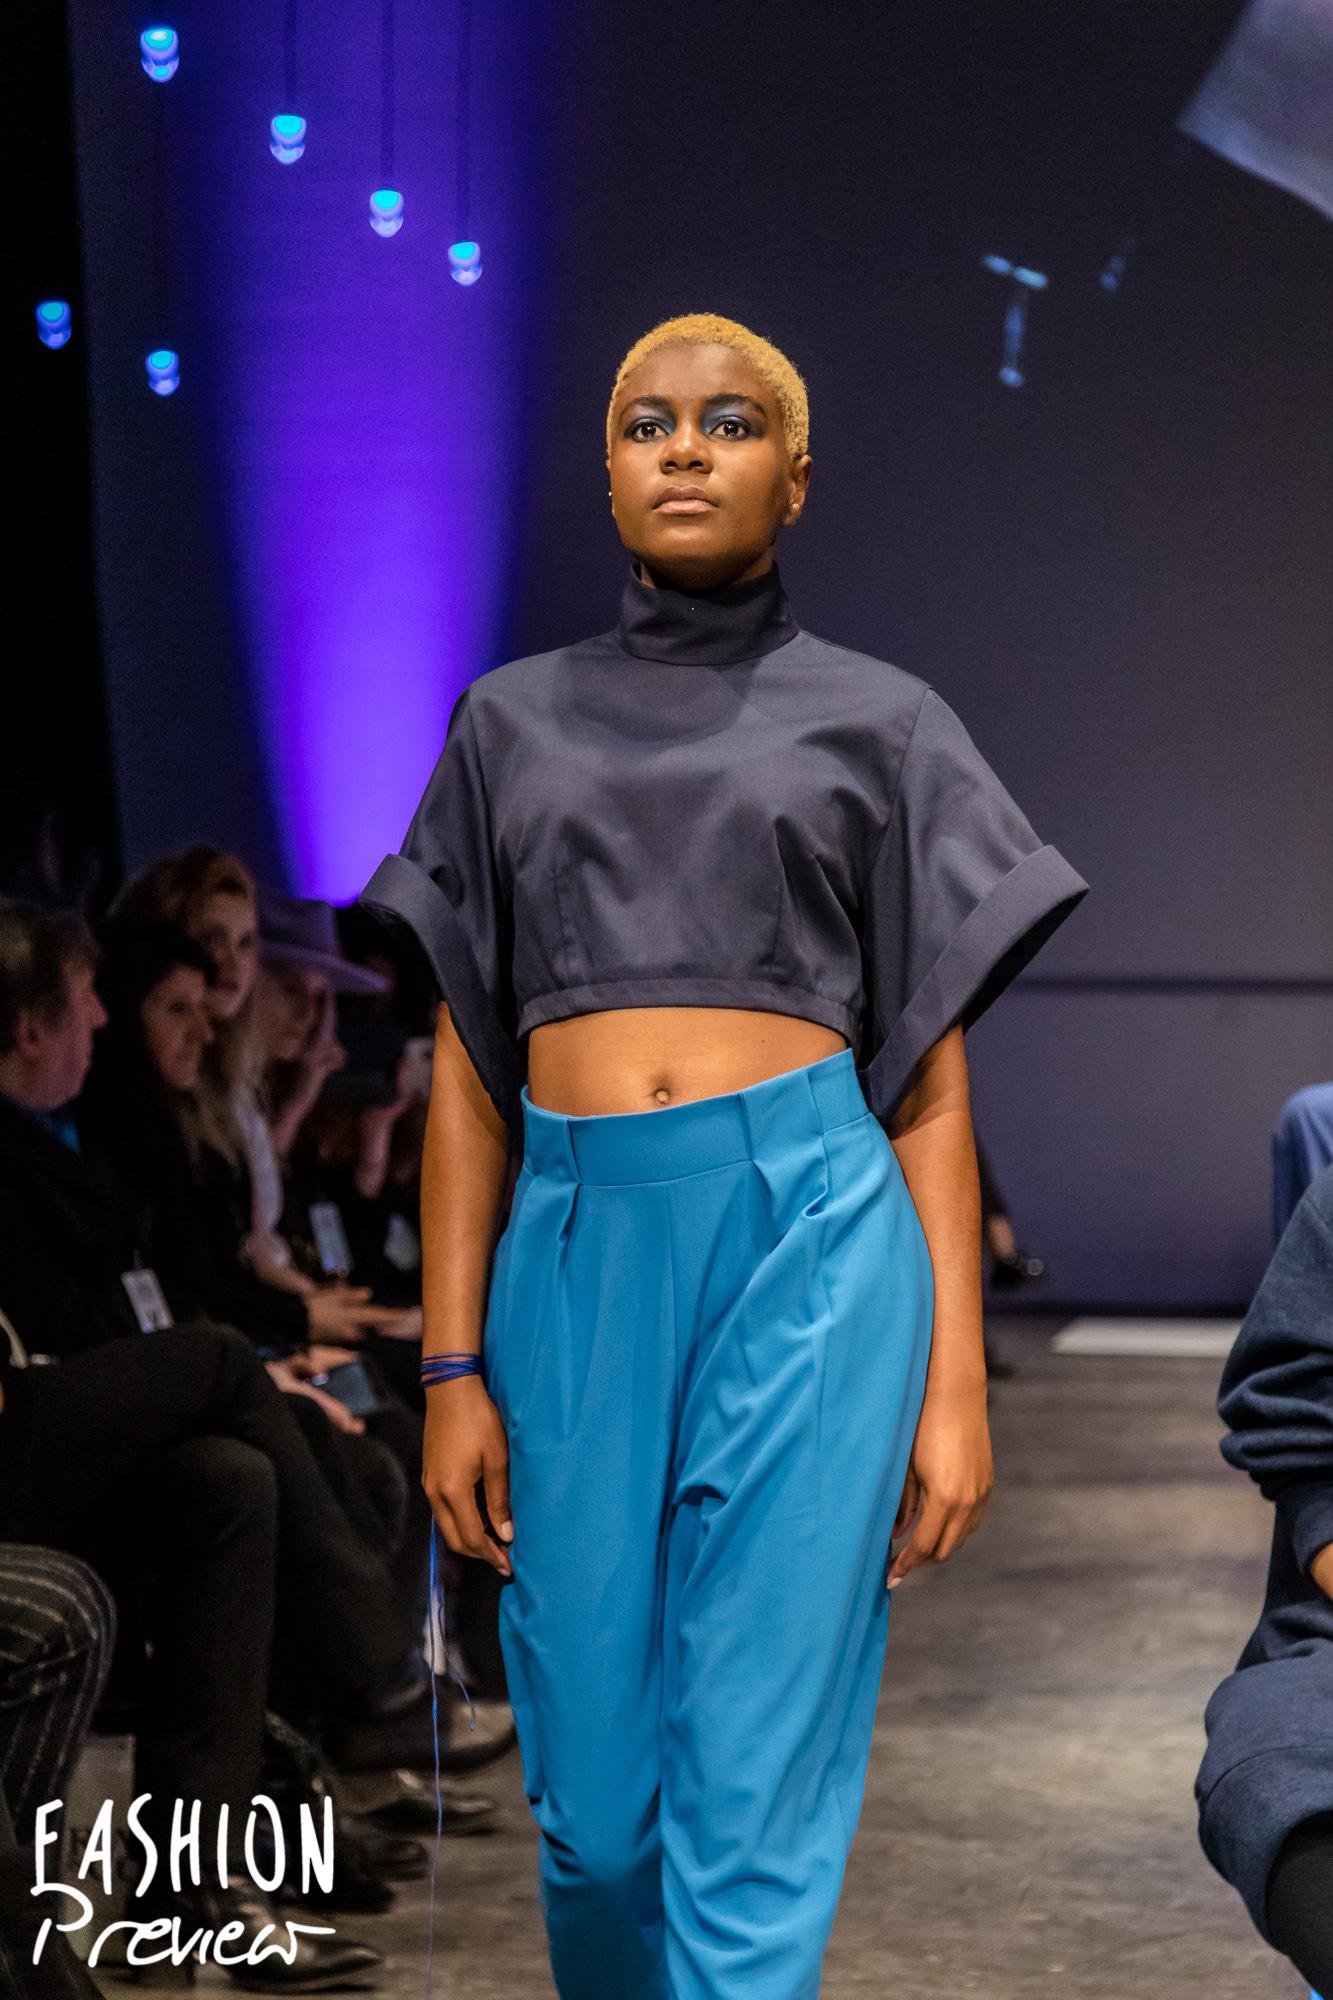 Fashion Preview 9 - Cegep Marie Victorin-09.jpg